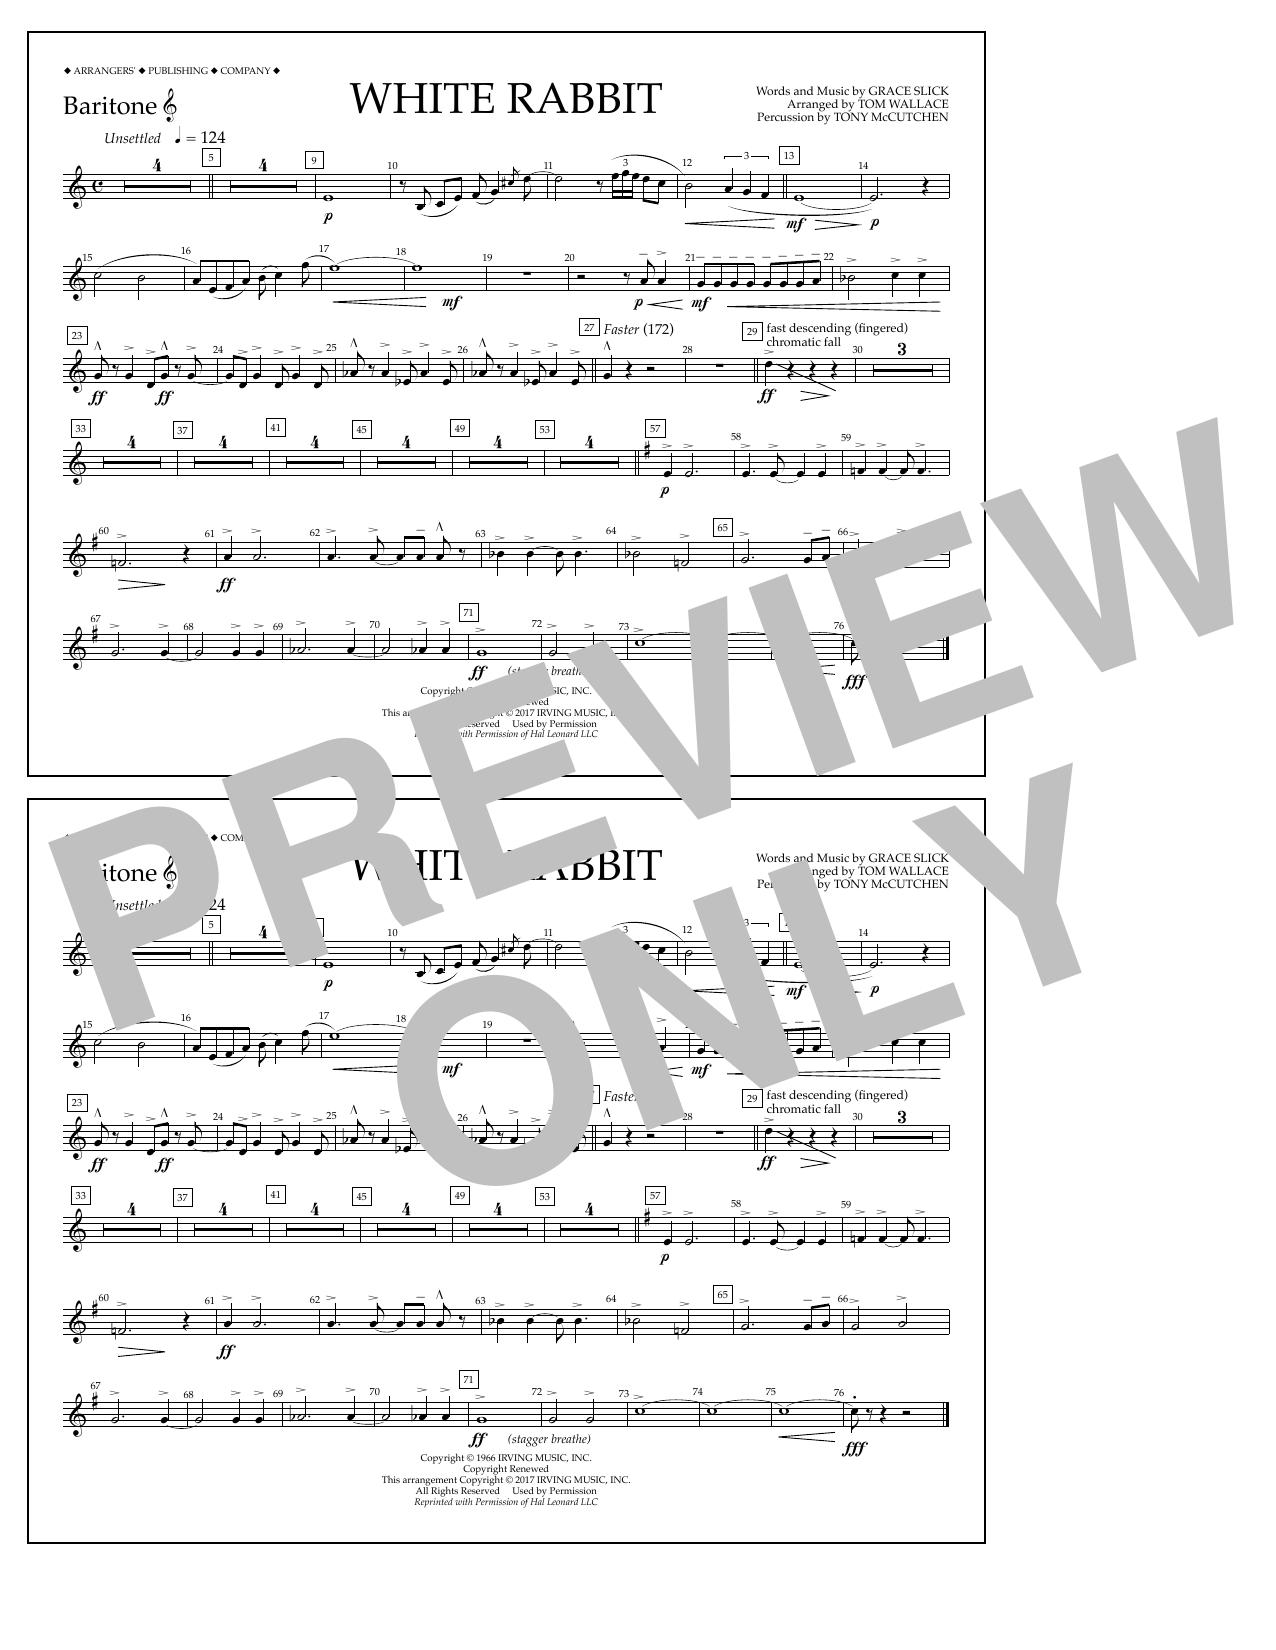 White Rabbit - Baritone T.C. Sheet Music